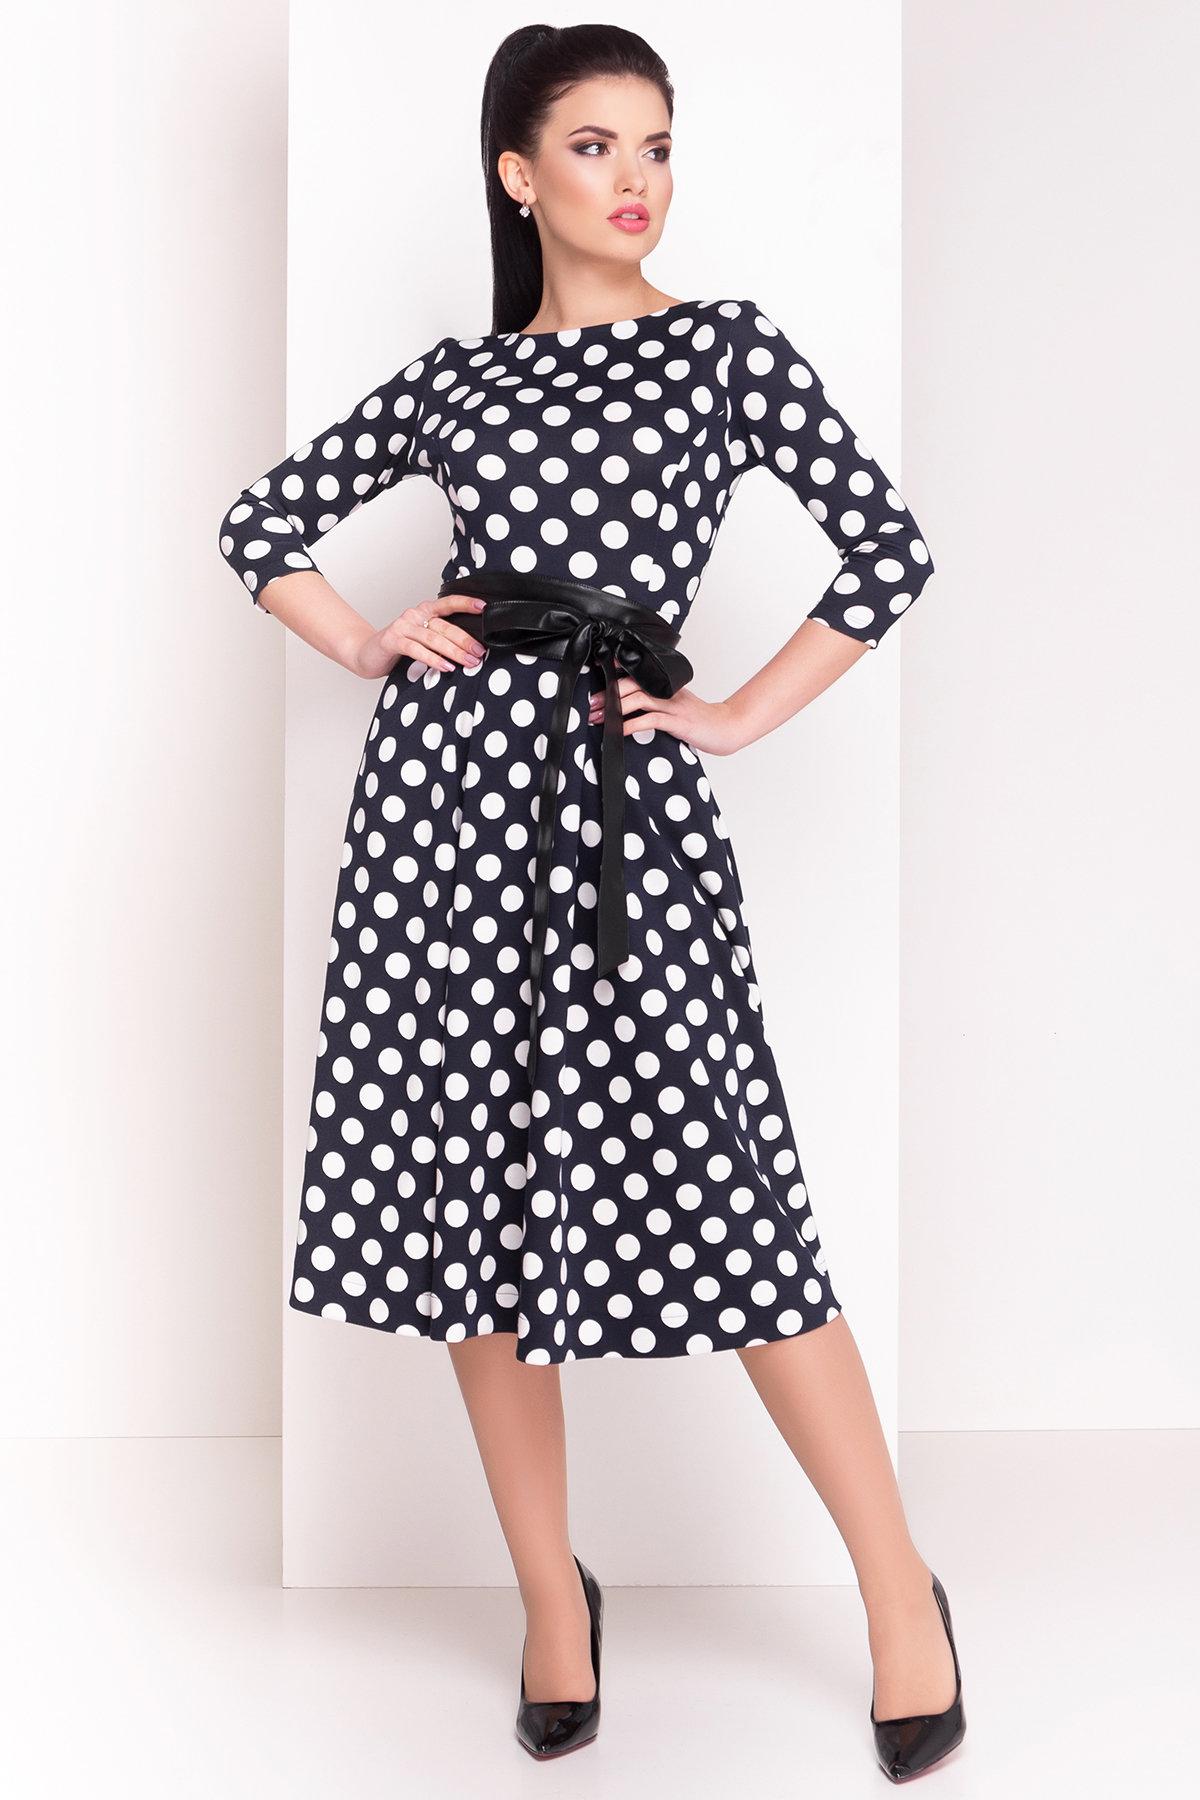 Платье Карен лайт 4835 Цвет: Темно-синий/горох белый